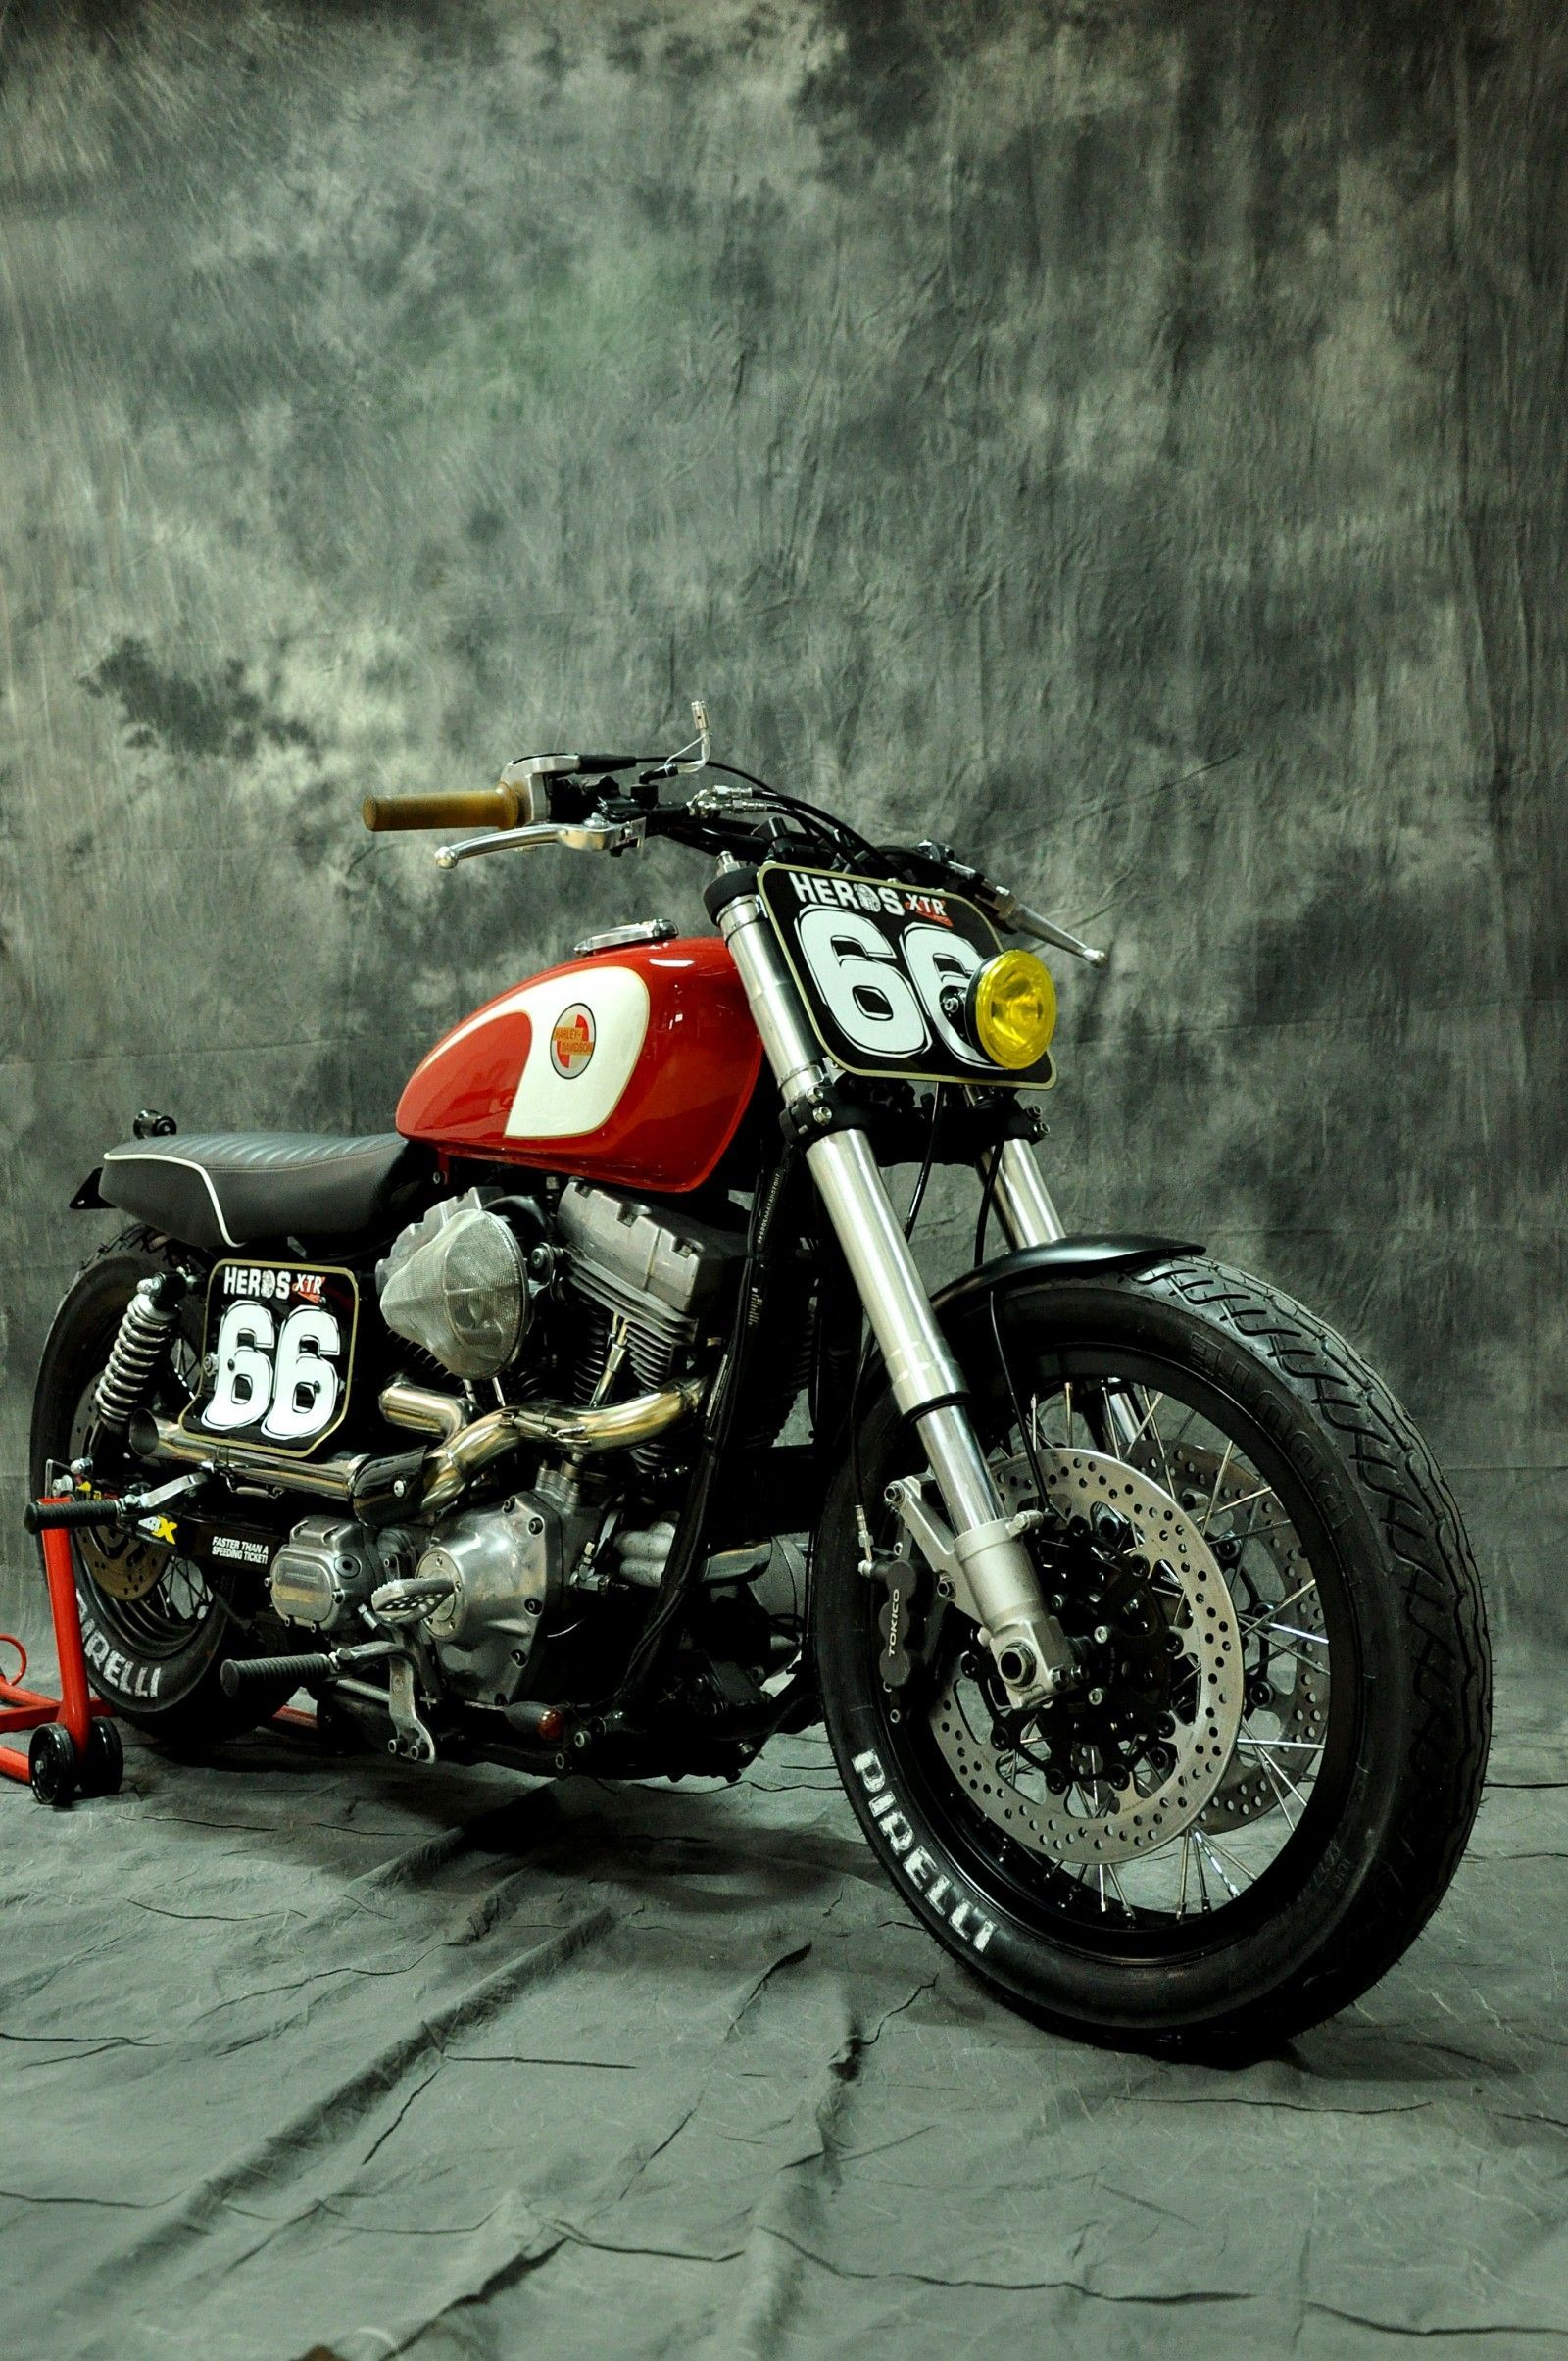 Harley Davidson Dyna Cafe Racer 1 Harleydavidsondyna